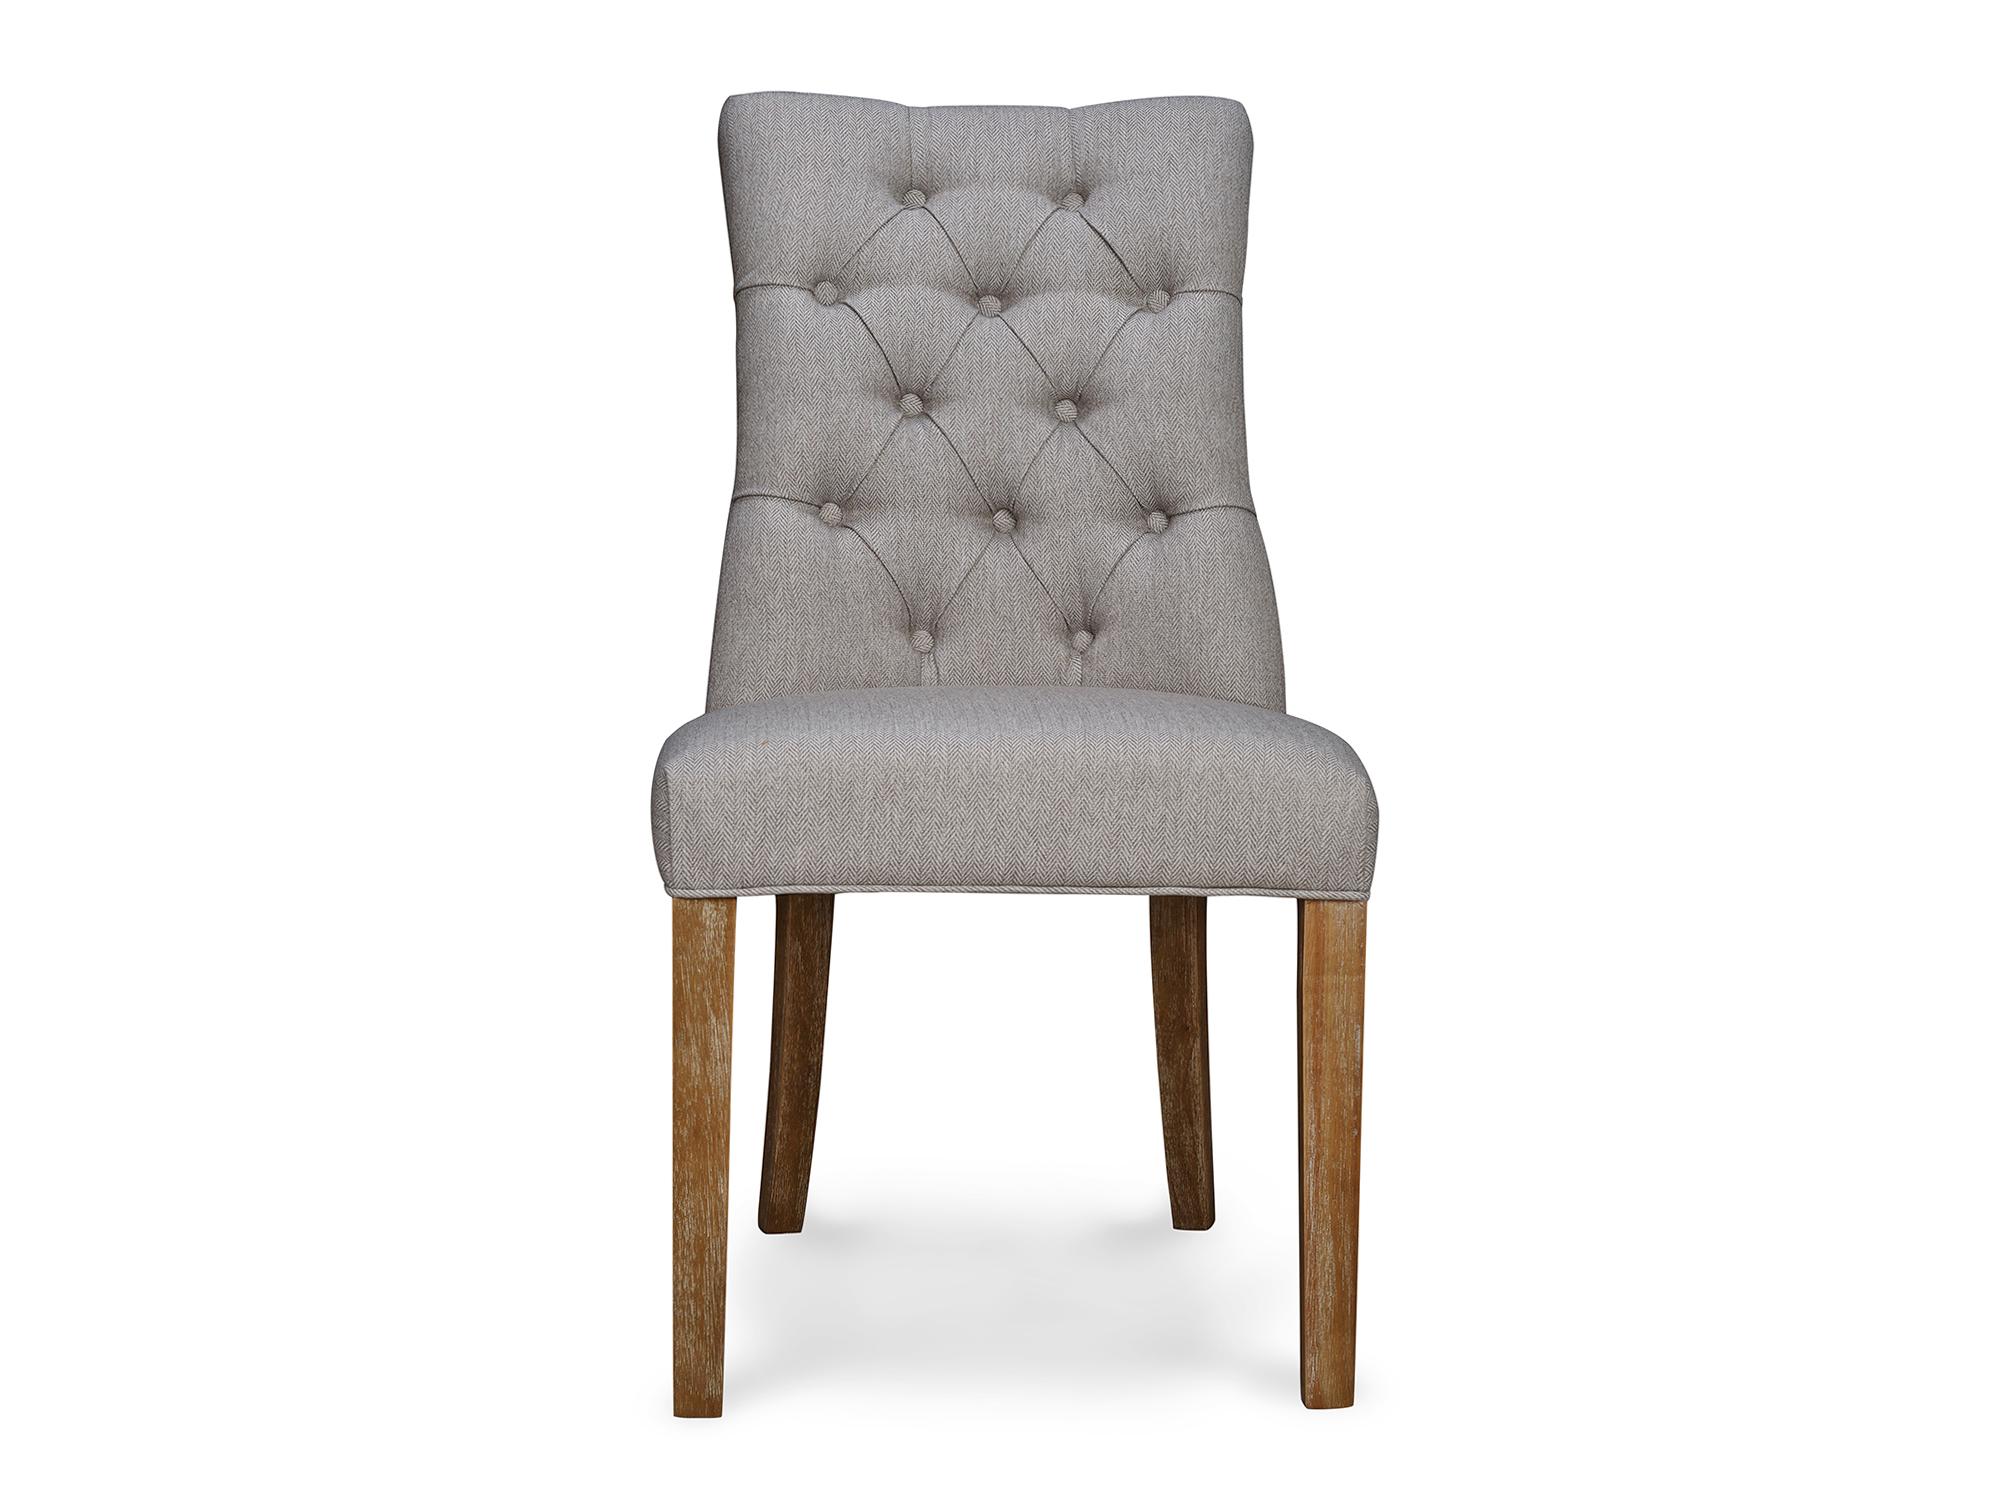 Martin Martin IIОбеденные стулья<br><br><br>Material: Текстиль